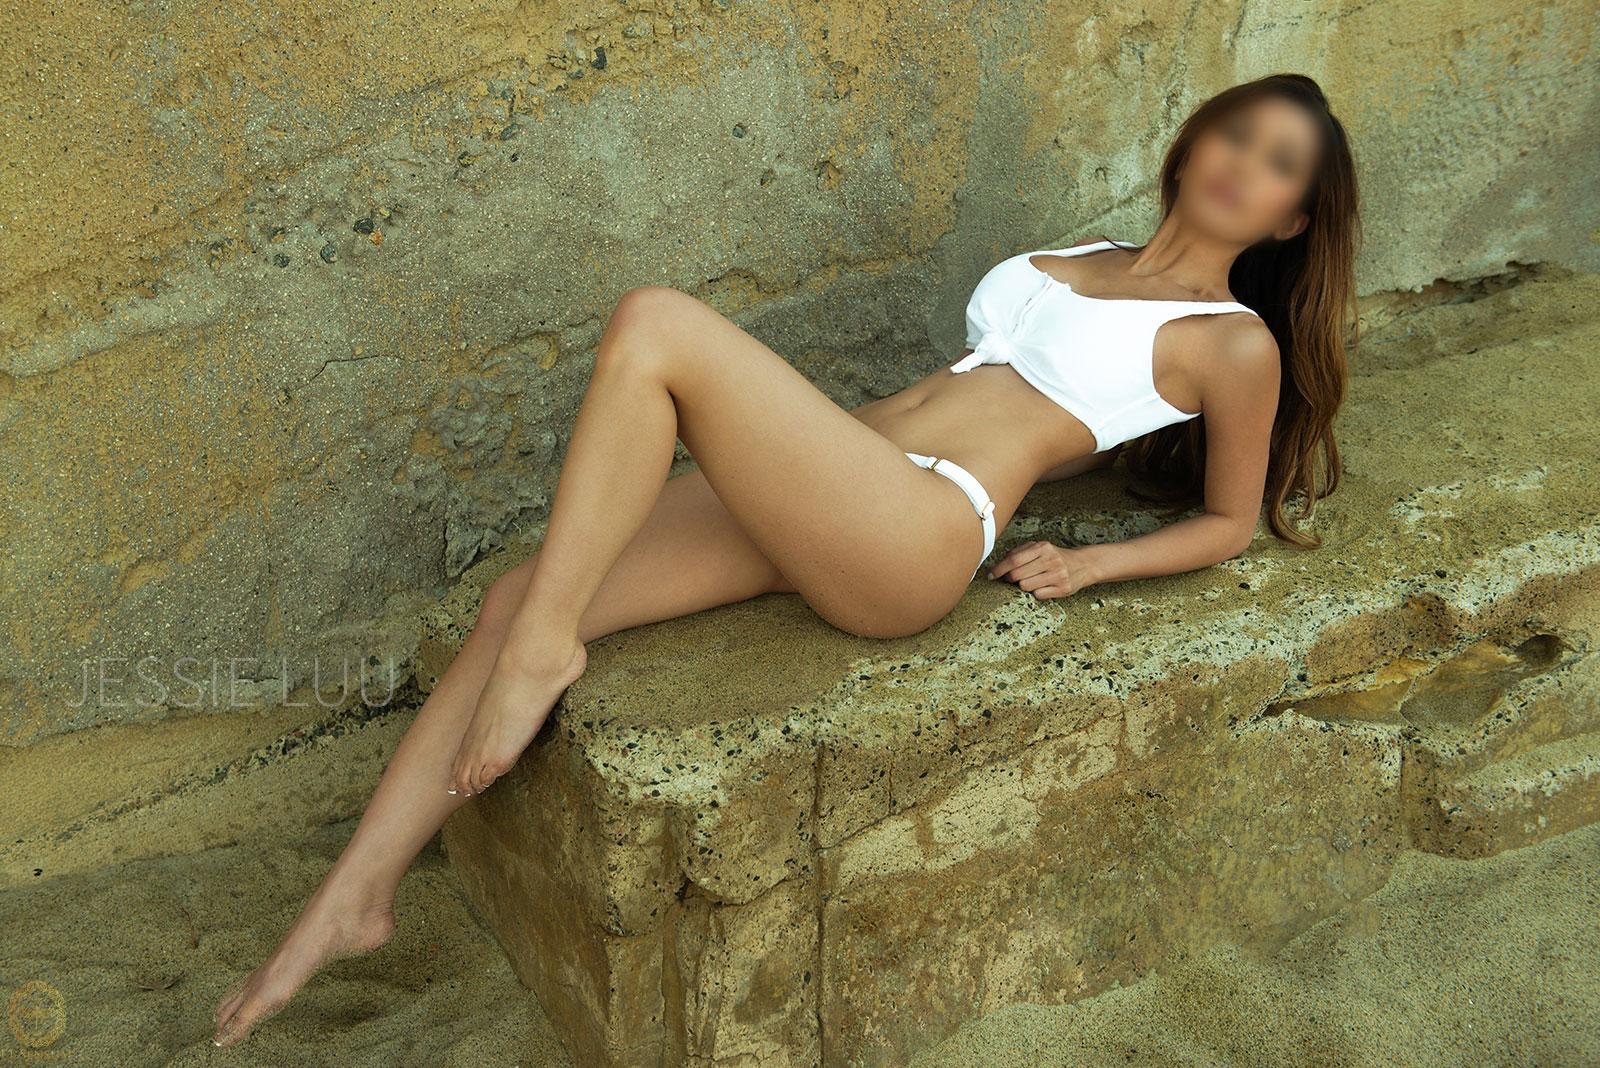 los-angeles-escort-model.jpg